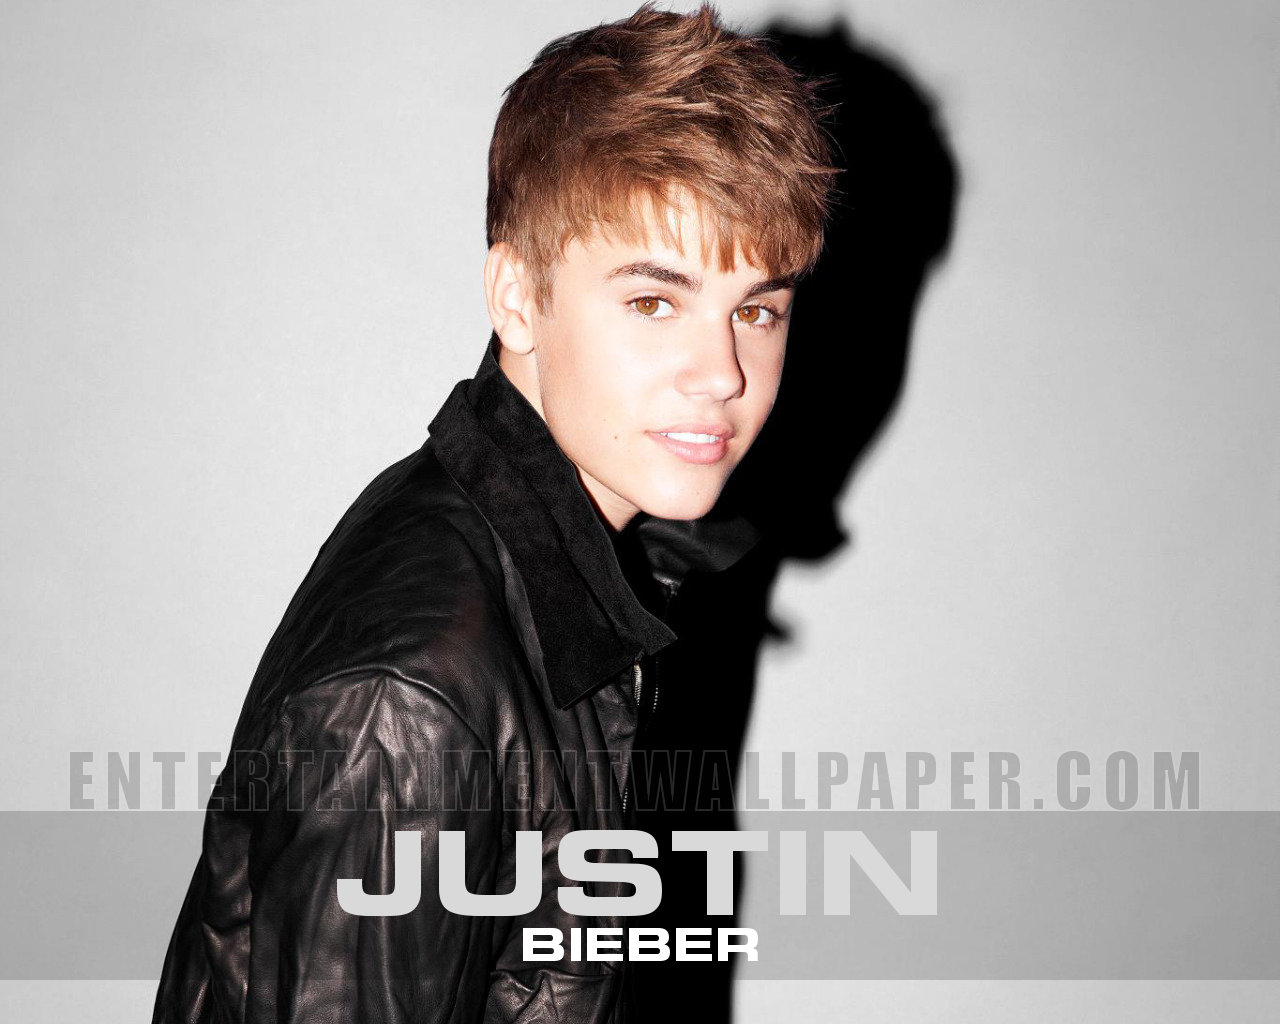 Justin Bieber Entertainment Desktop